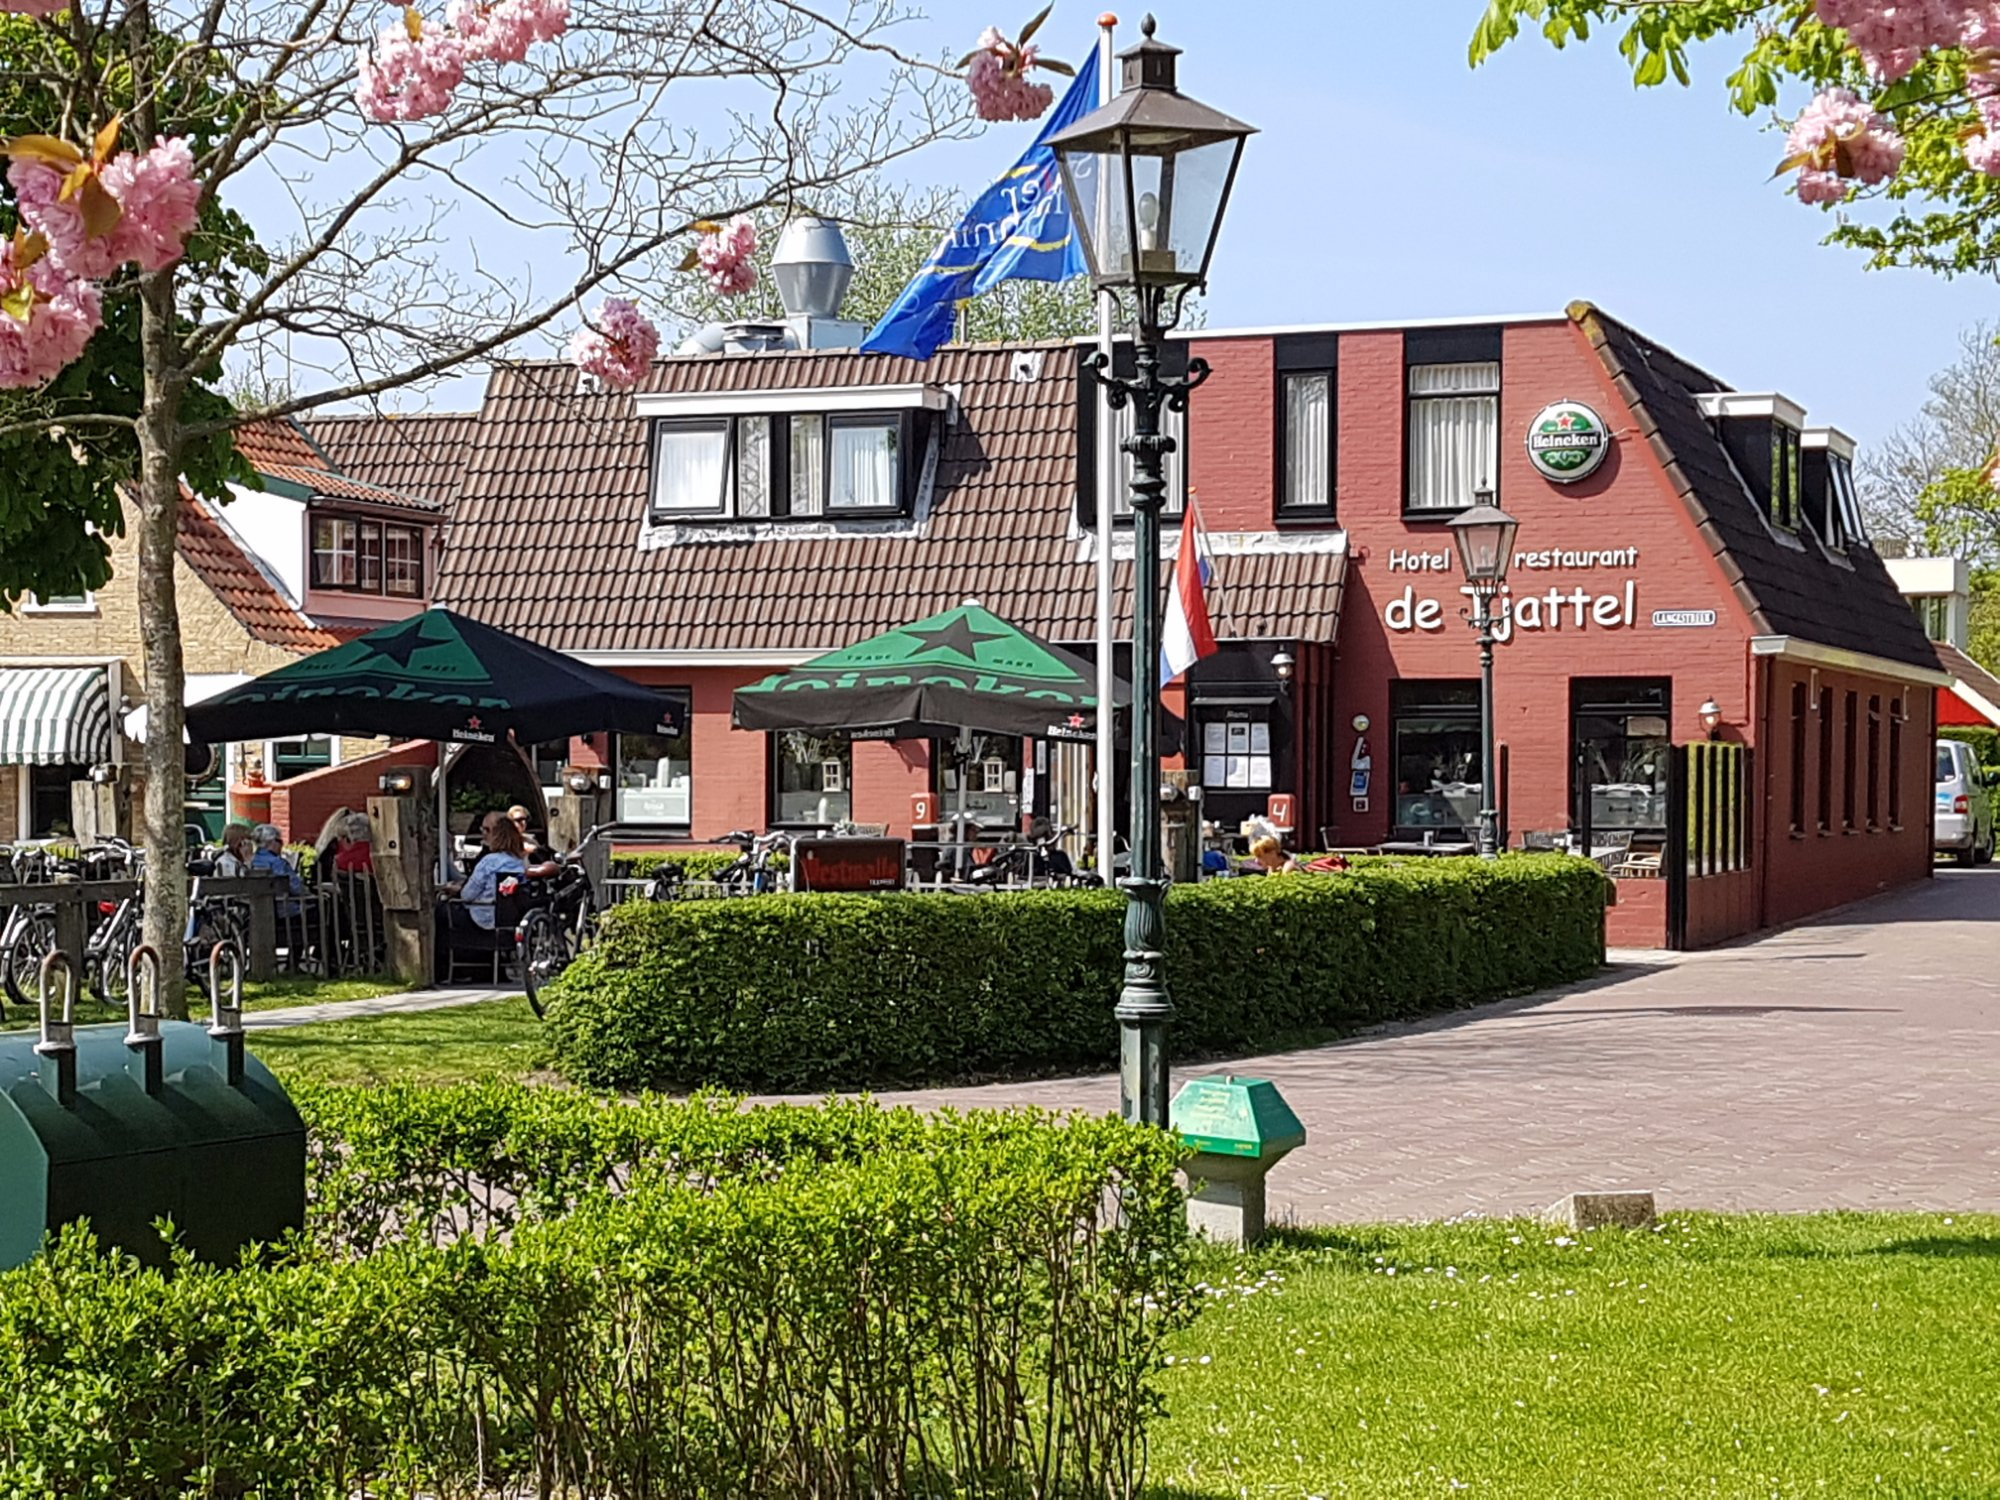 Hotel restaurant de Tjattel